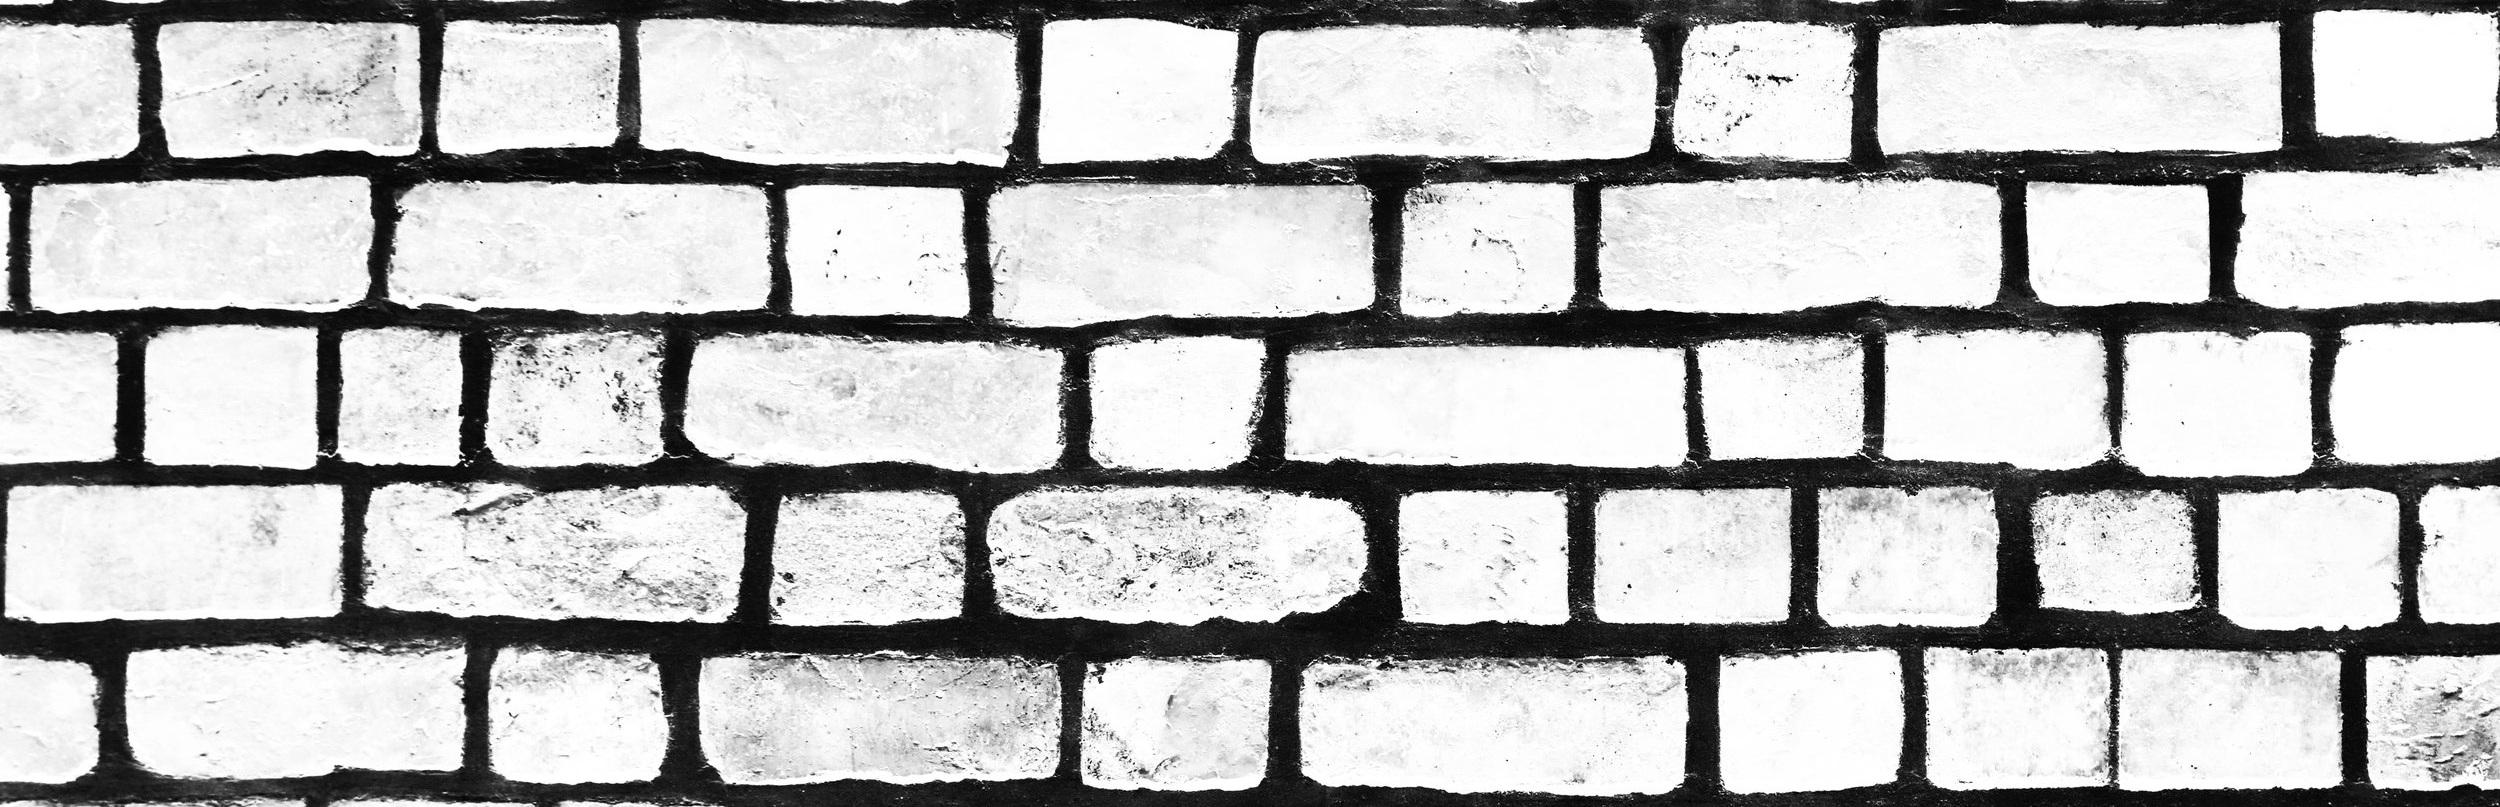 brickwhite.jpg